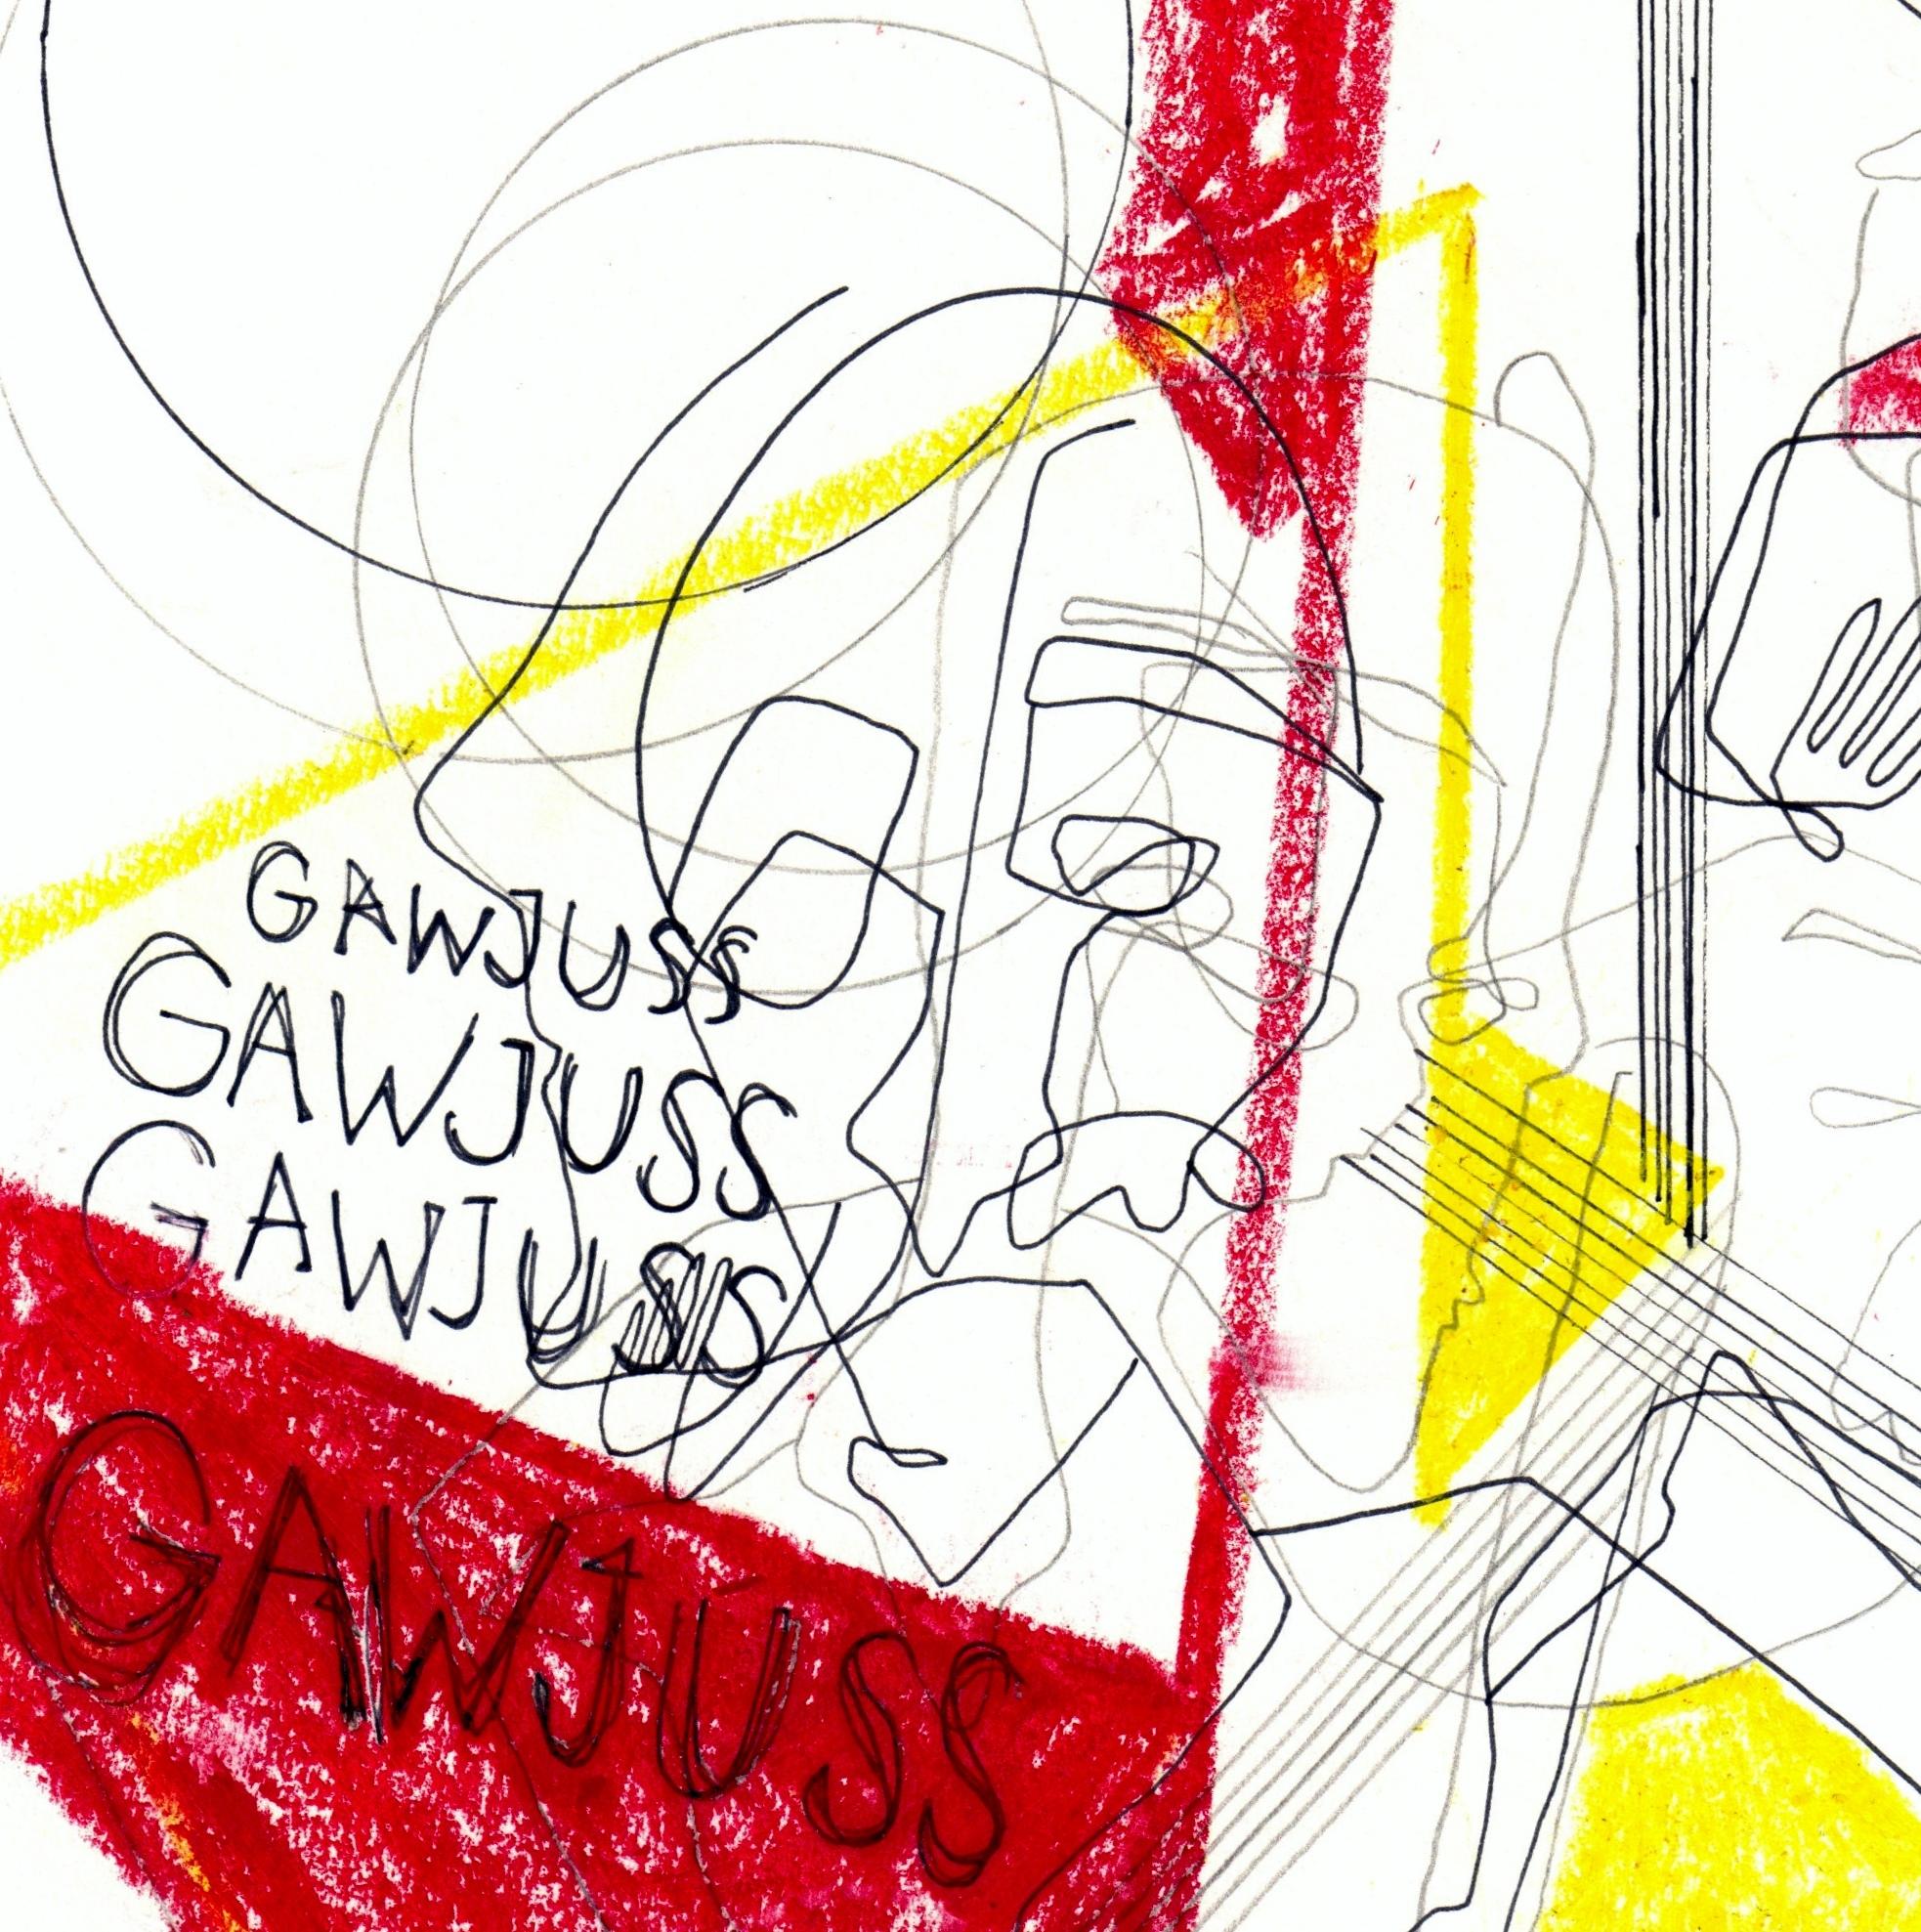 Gawjuss - Gawjuss [EP] - Clue Records